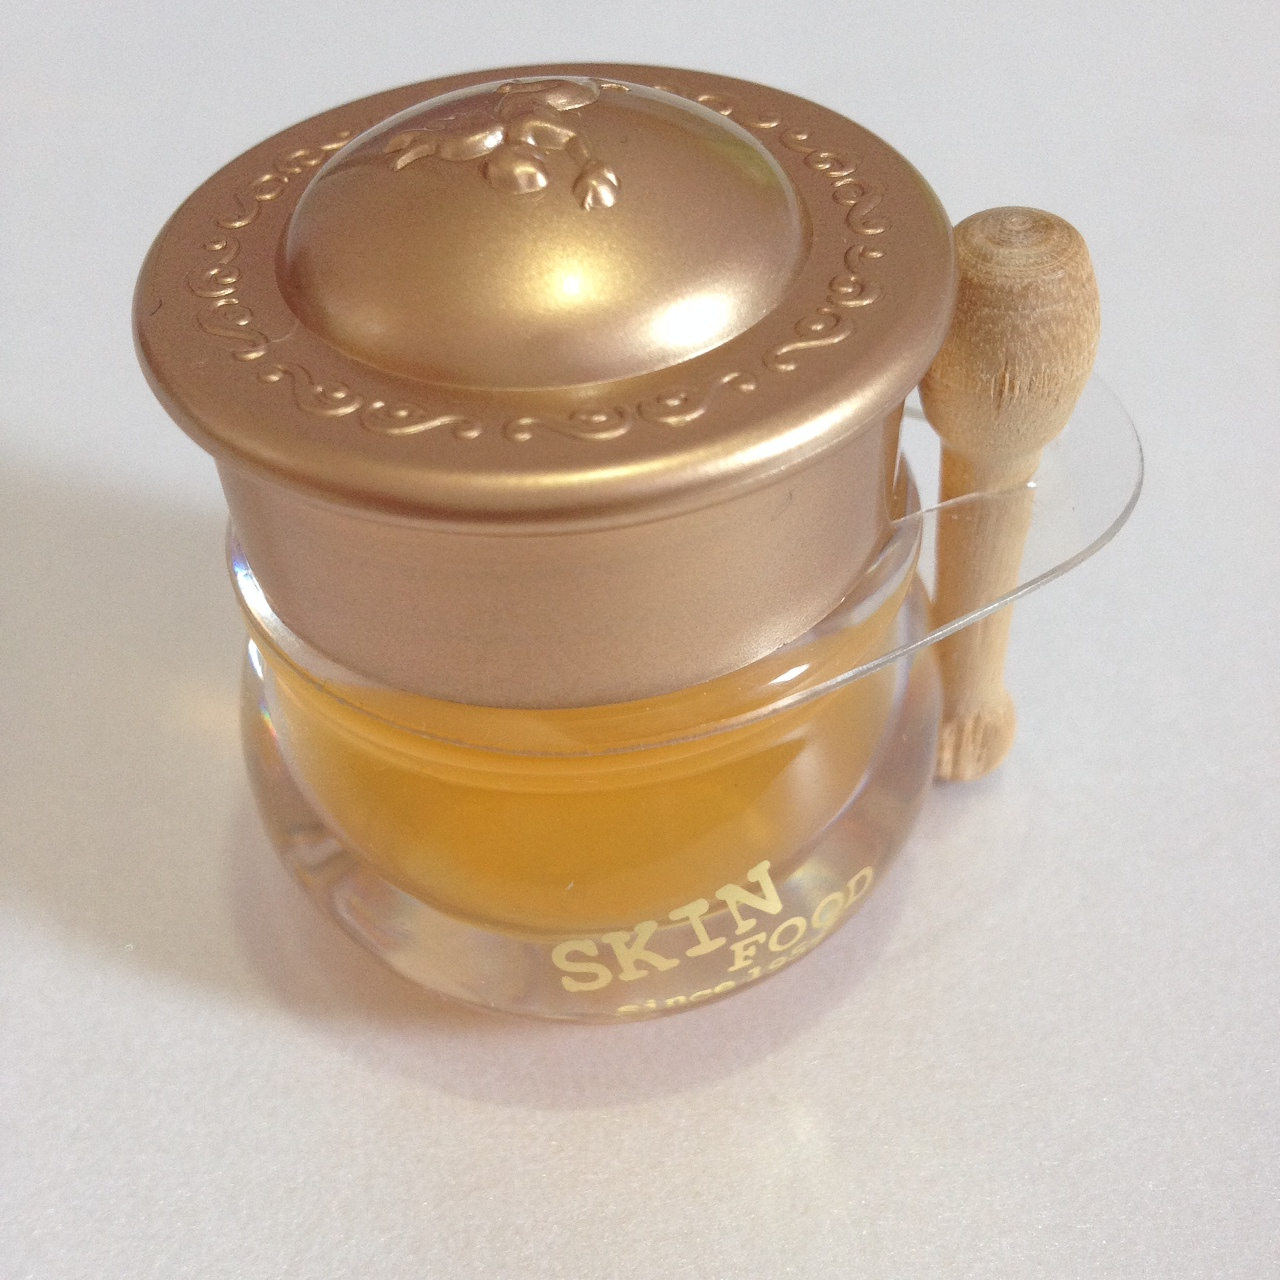 skin-food-honey-pot-lip-balm